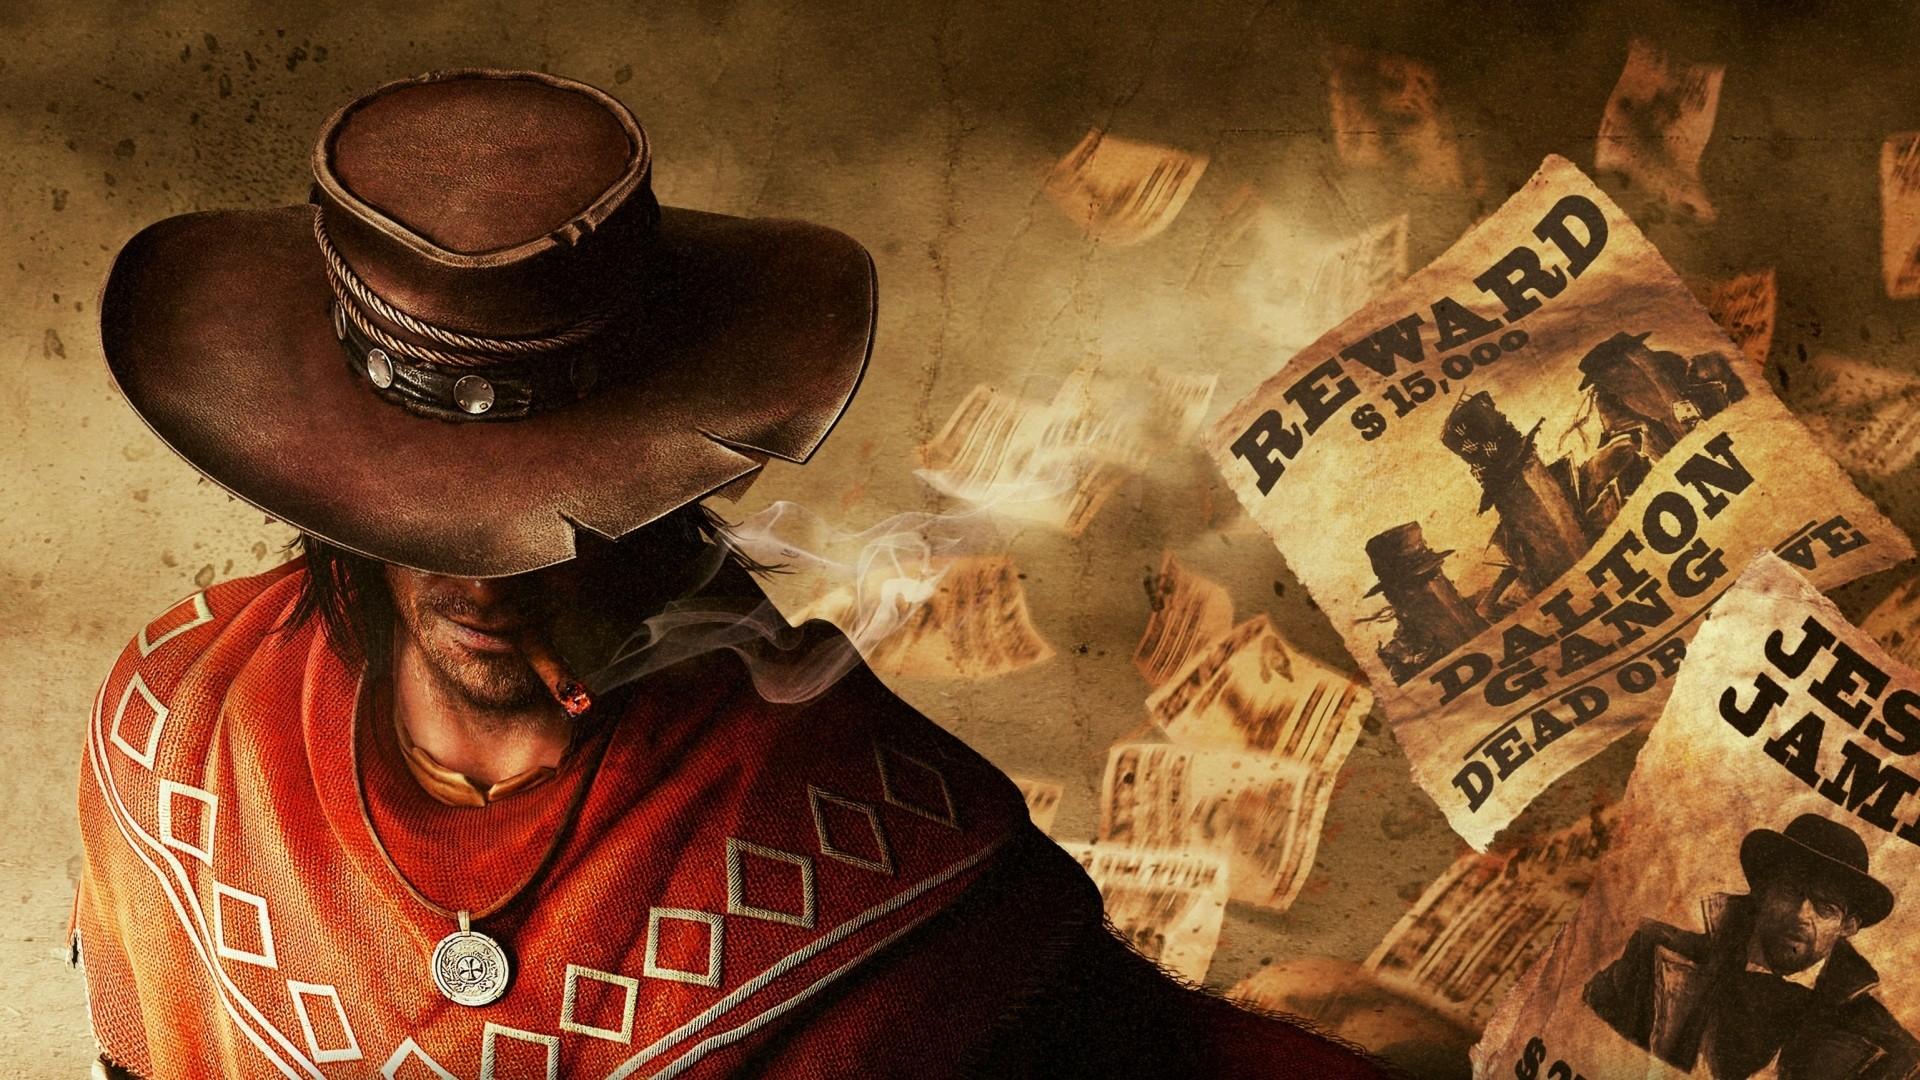 western bounty hunter Call Of Juarez wild west gunslinger cowboy 1920x1080